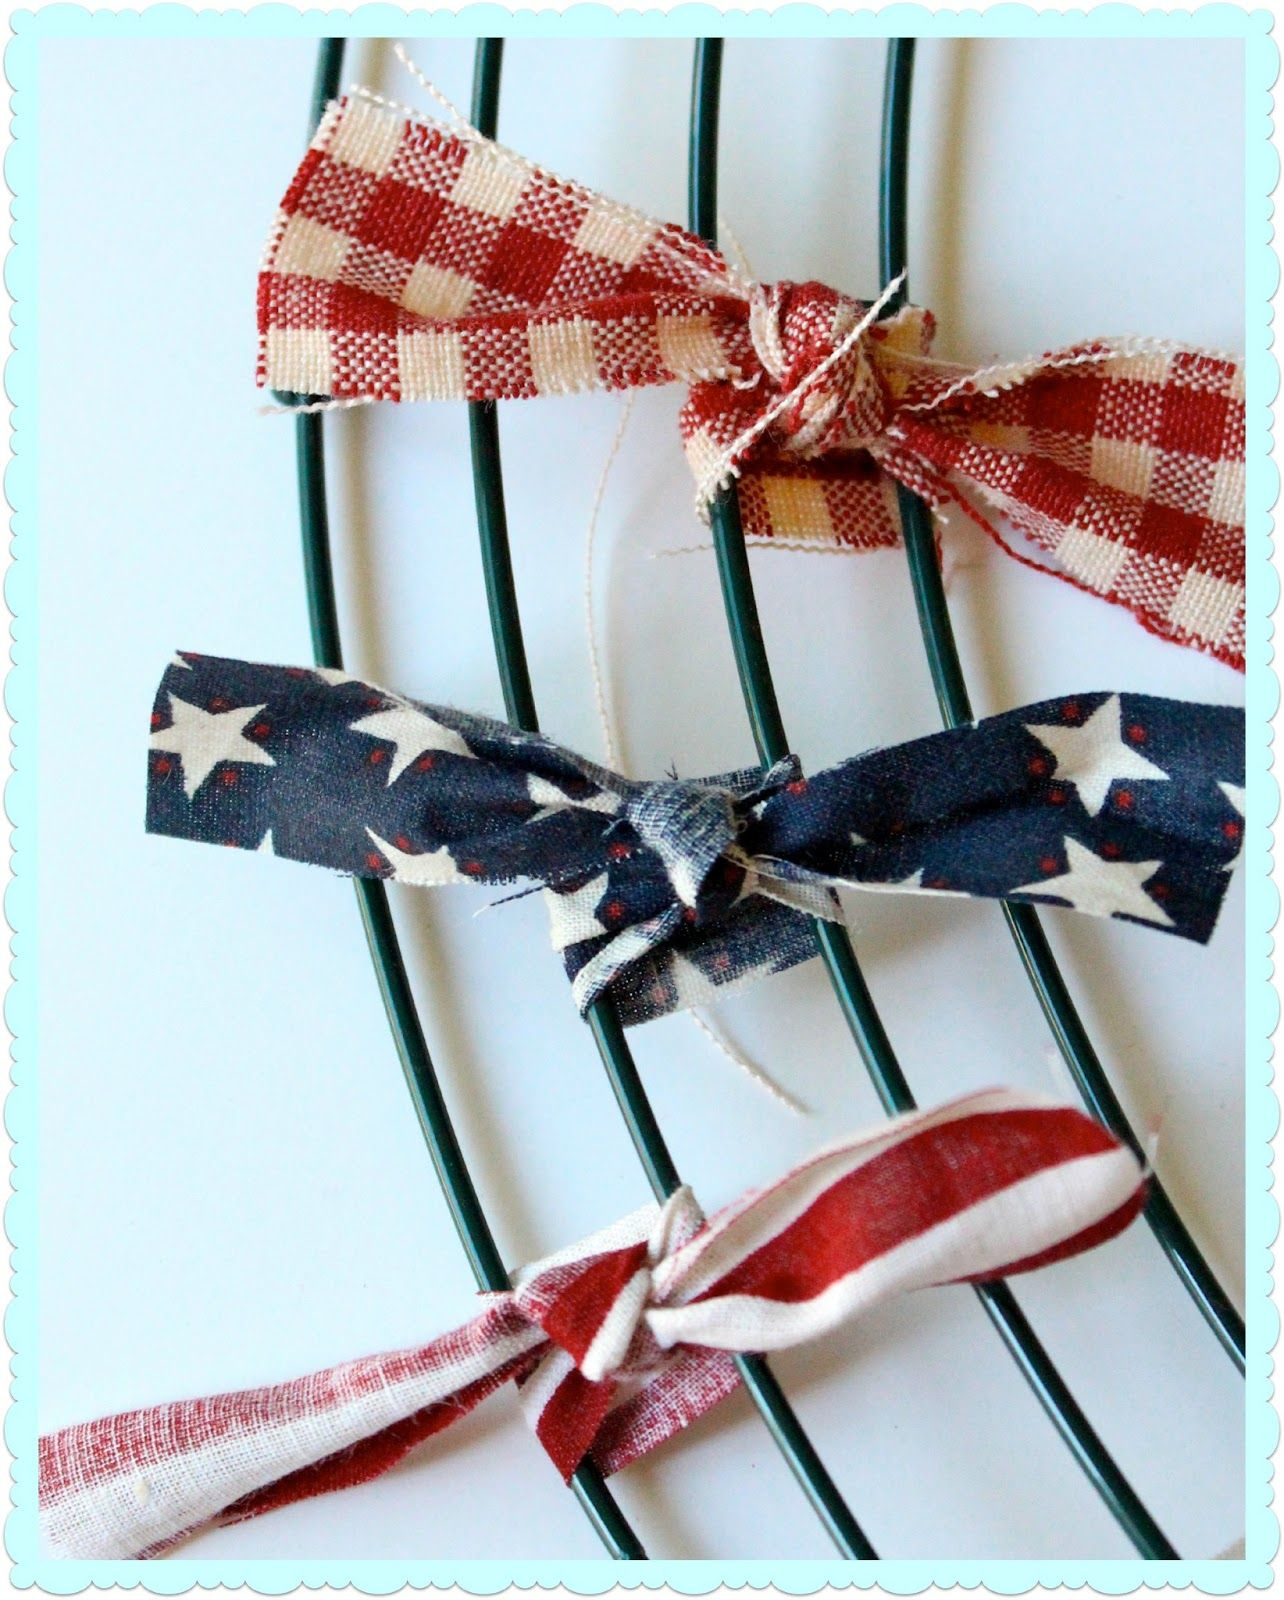 Ribbon wreath tutorial on wire hanger - Oh Sew Crafty Life Patriotic Rag Wreath Tutorial